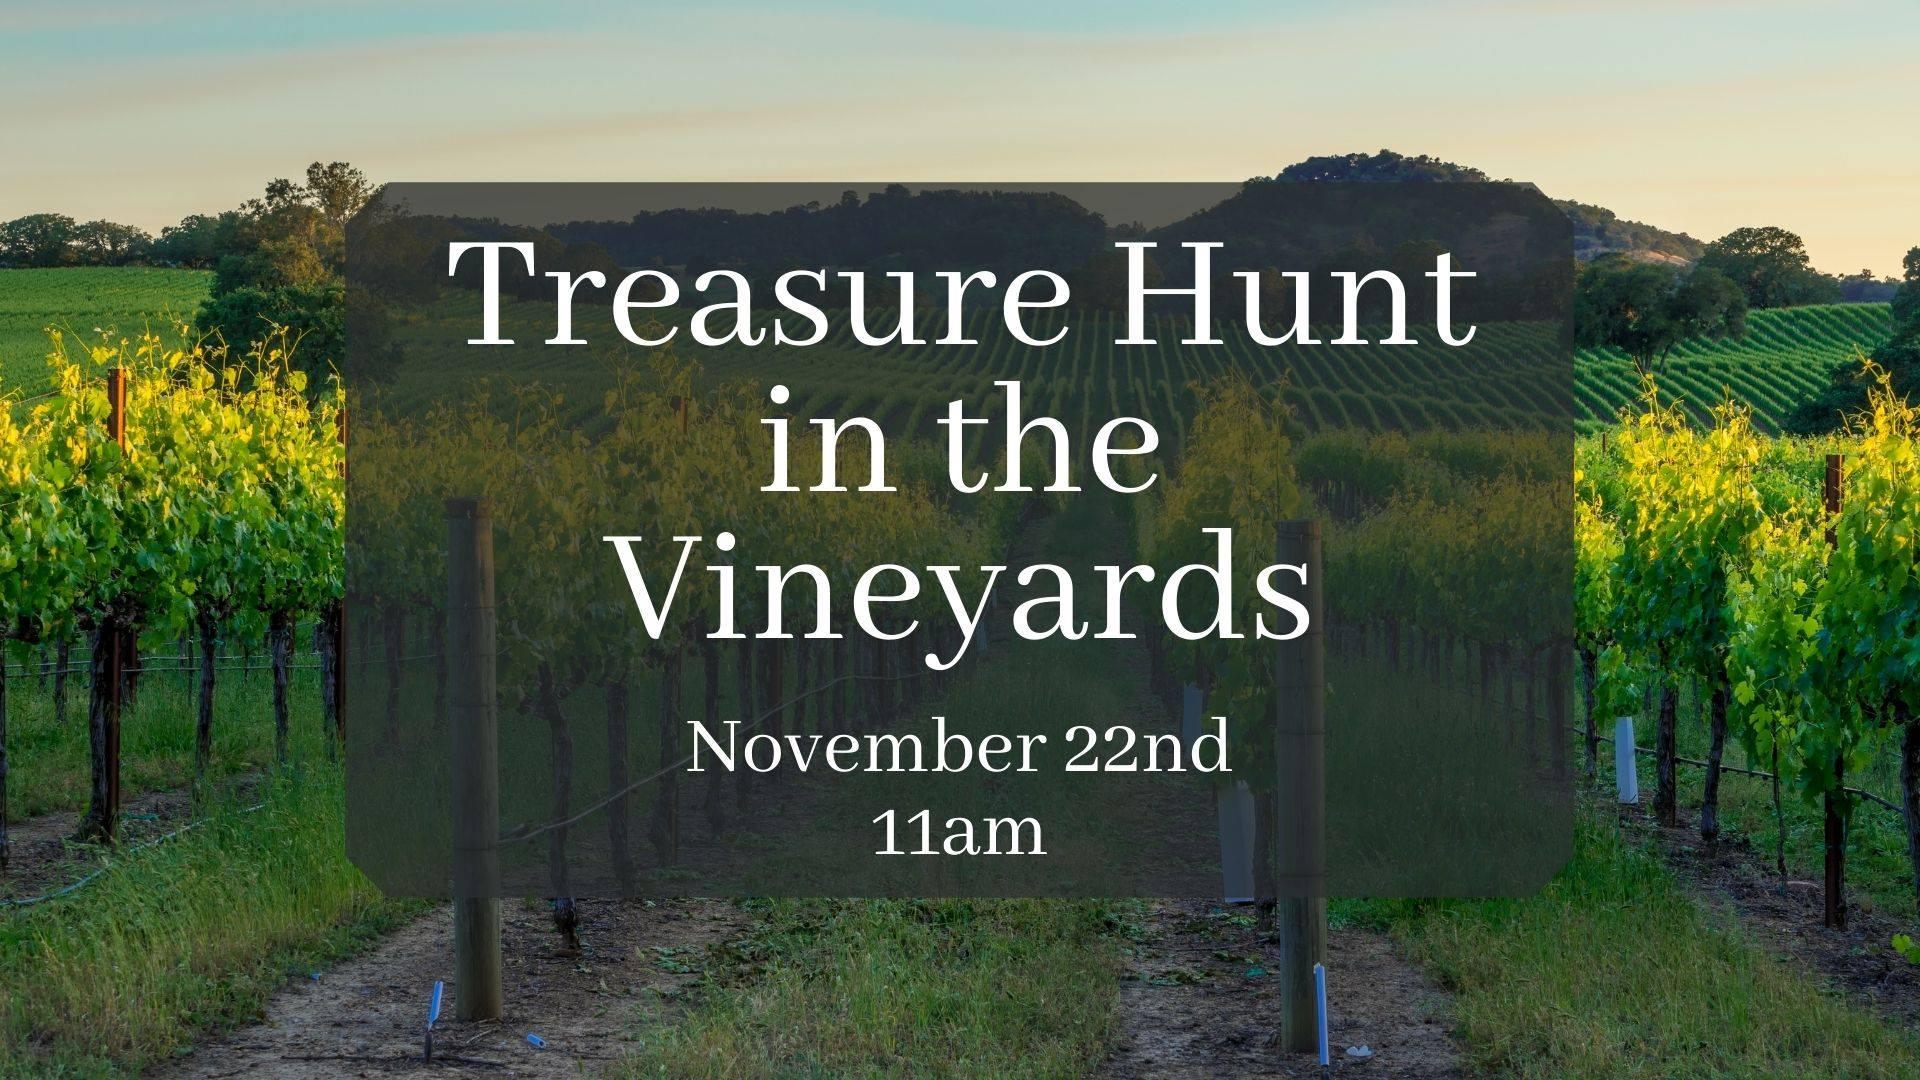 trasure hunt pic - Treasure Hunt in the Vineyard at The Great Oregon Wine Company